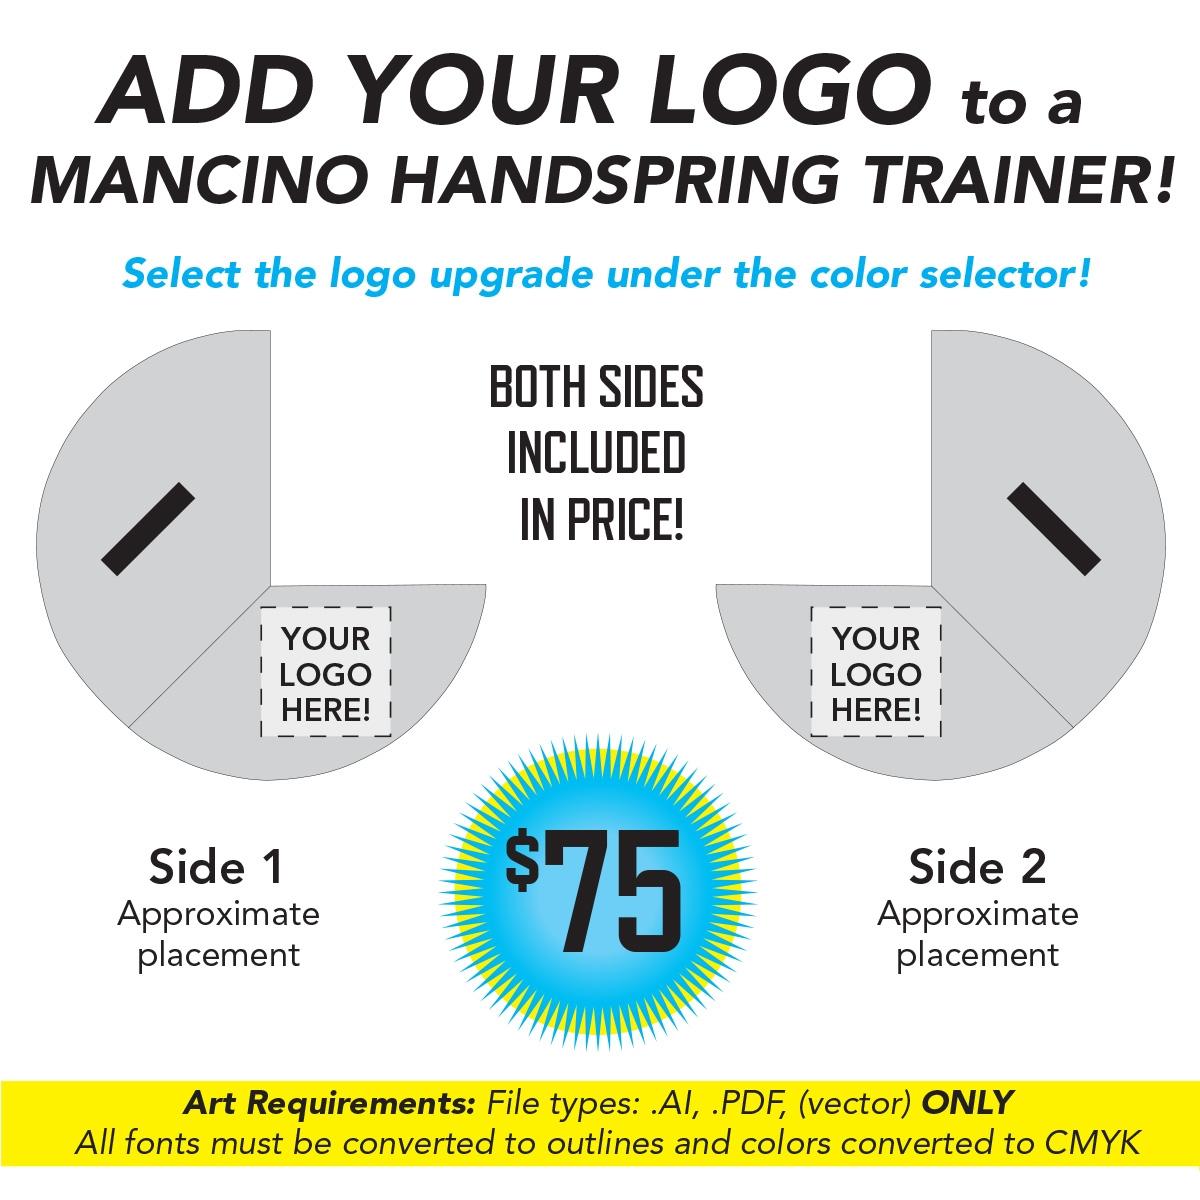 brand your logo onto a mancino handspring trainer mat